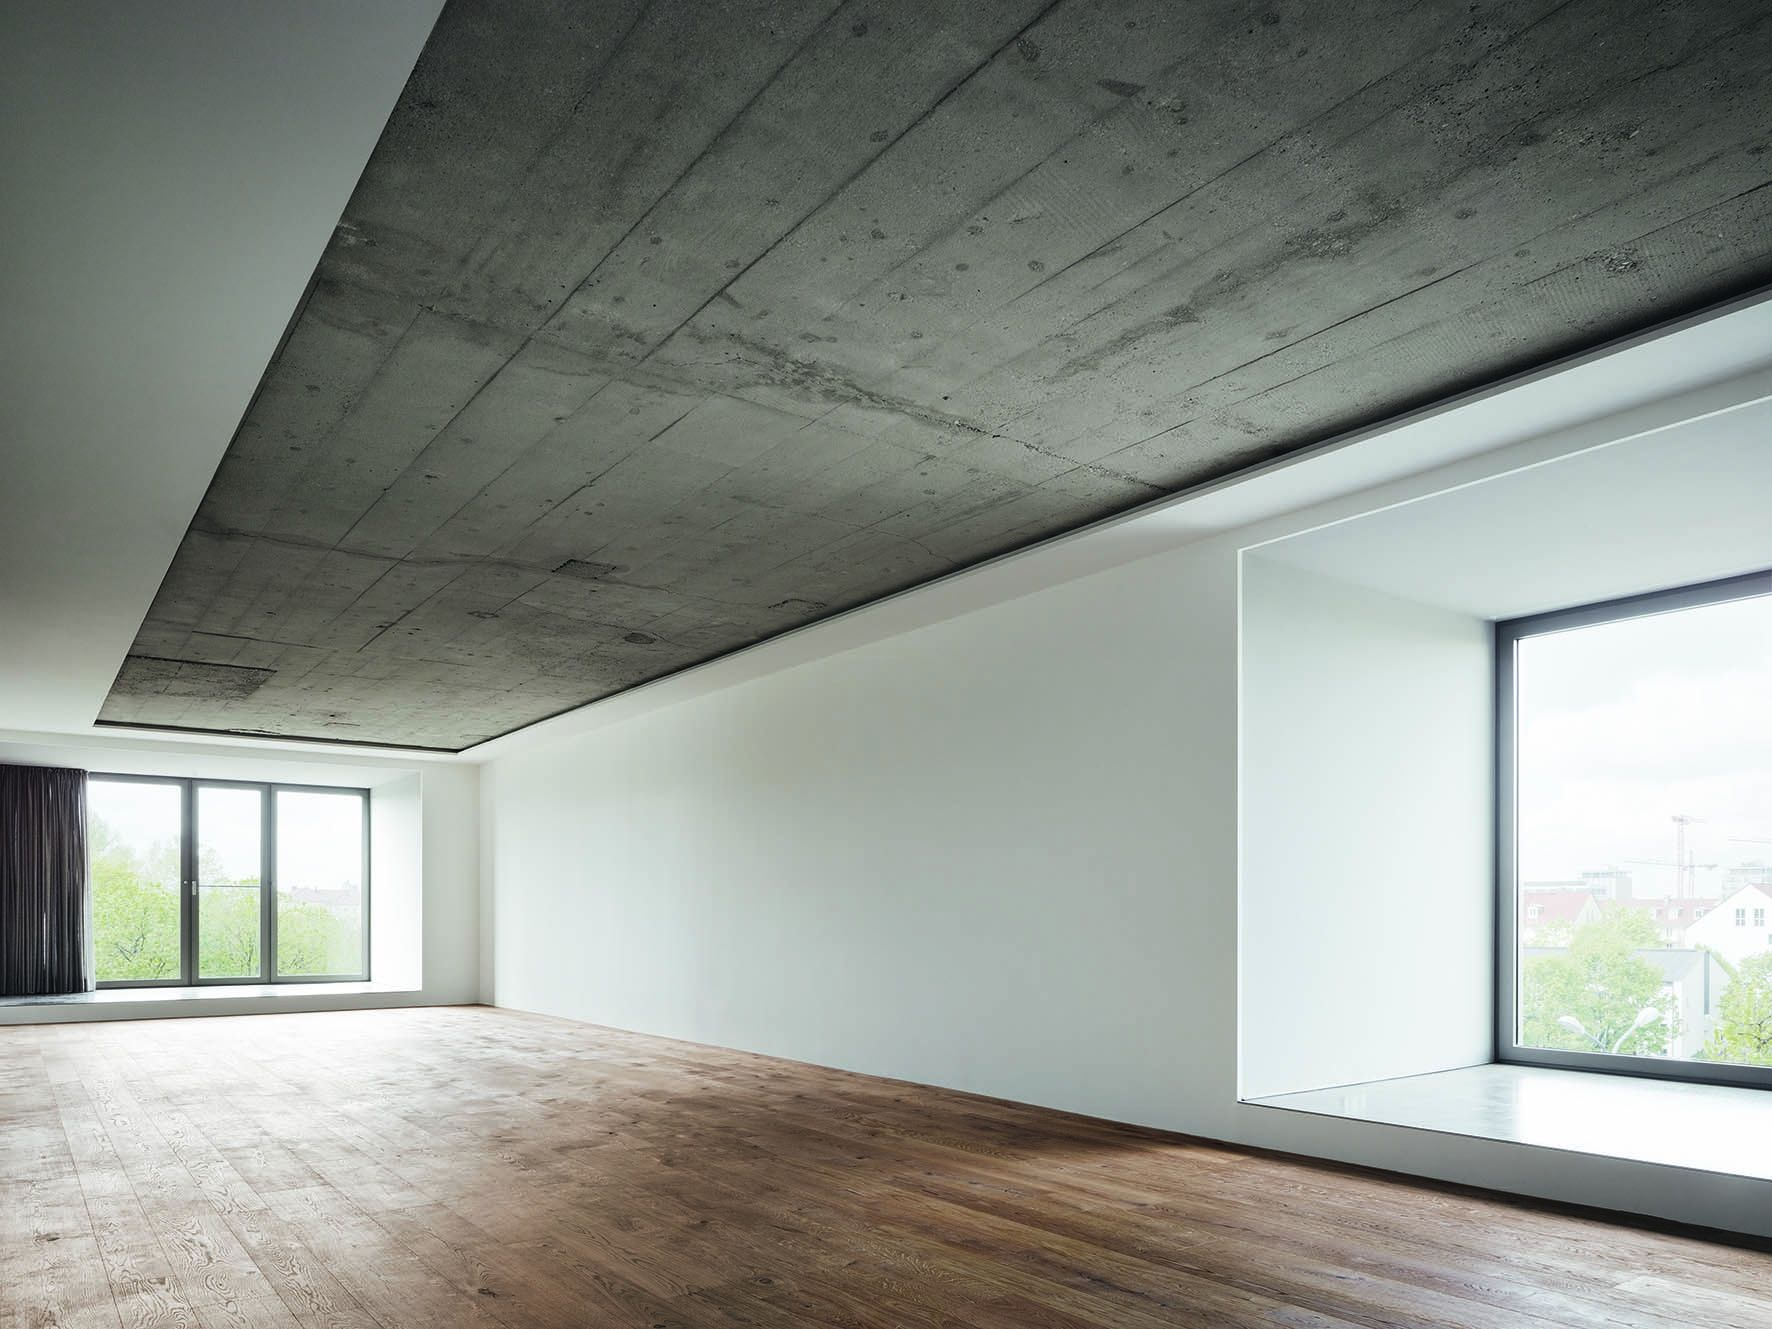 Betondecke | Home & Decor | Pinterest | Empty spaces, Interiors and ...